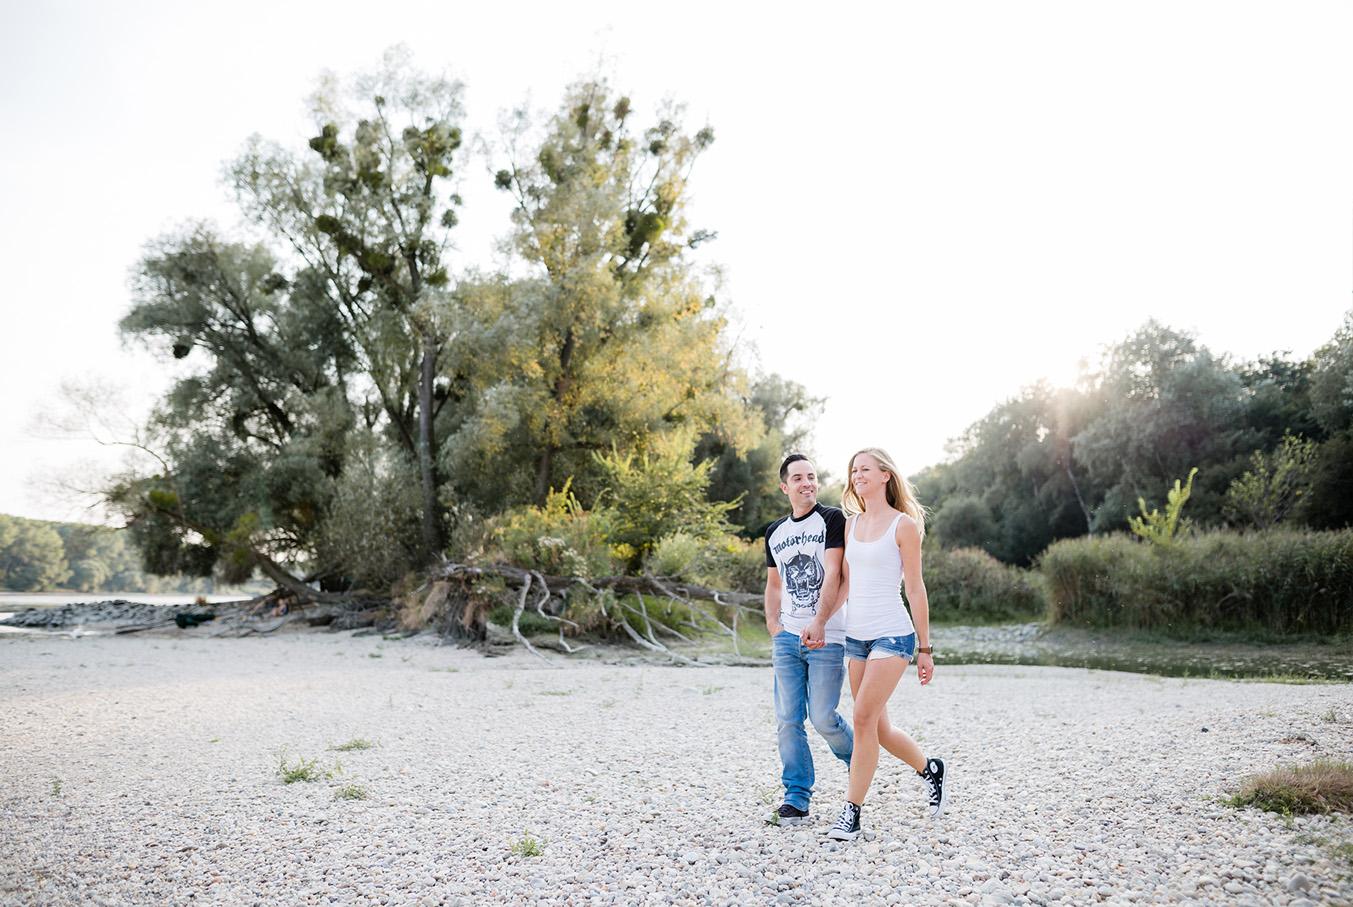 Vienna_Wien_Couple_Hochzeit_Paar_Verlobung_Engagement_Shooting_07